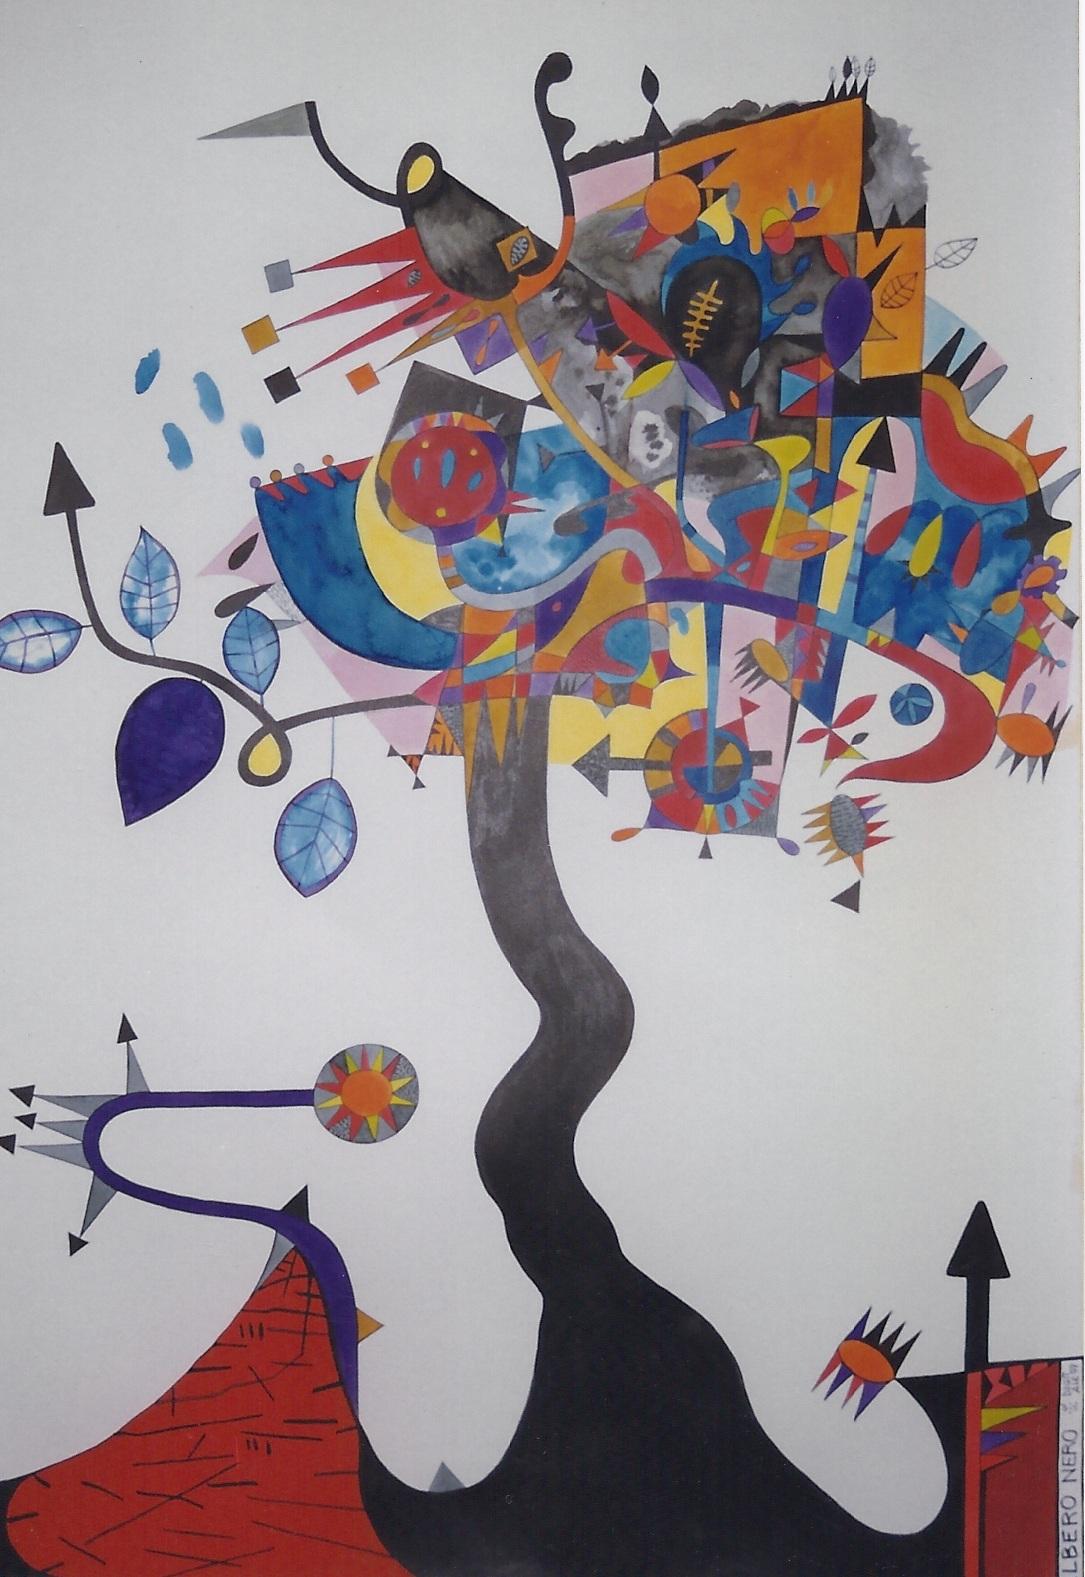 ALBERO NERO tecnica mista pittura su carta cm 70 x cm 100 1997